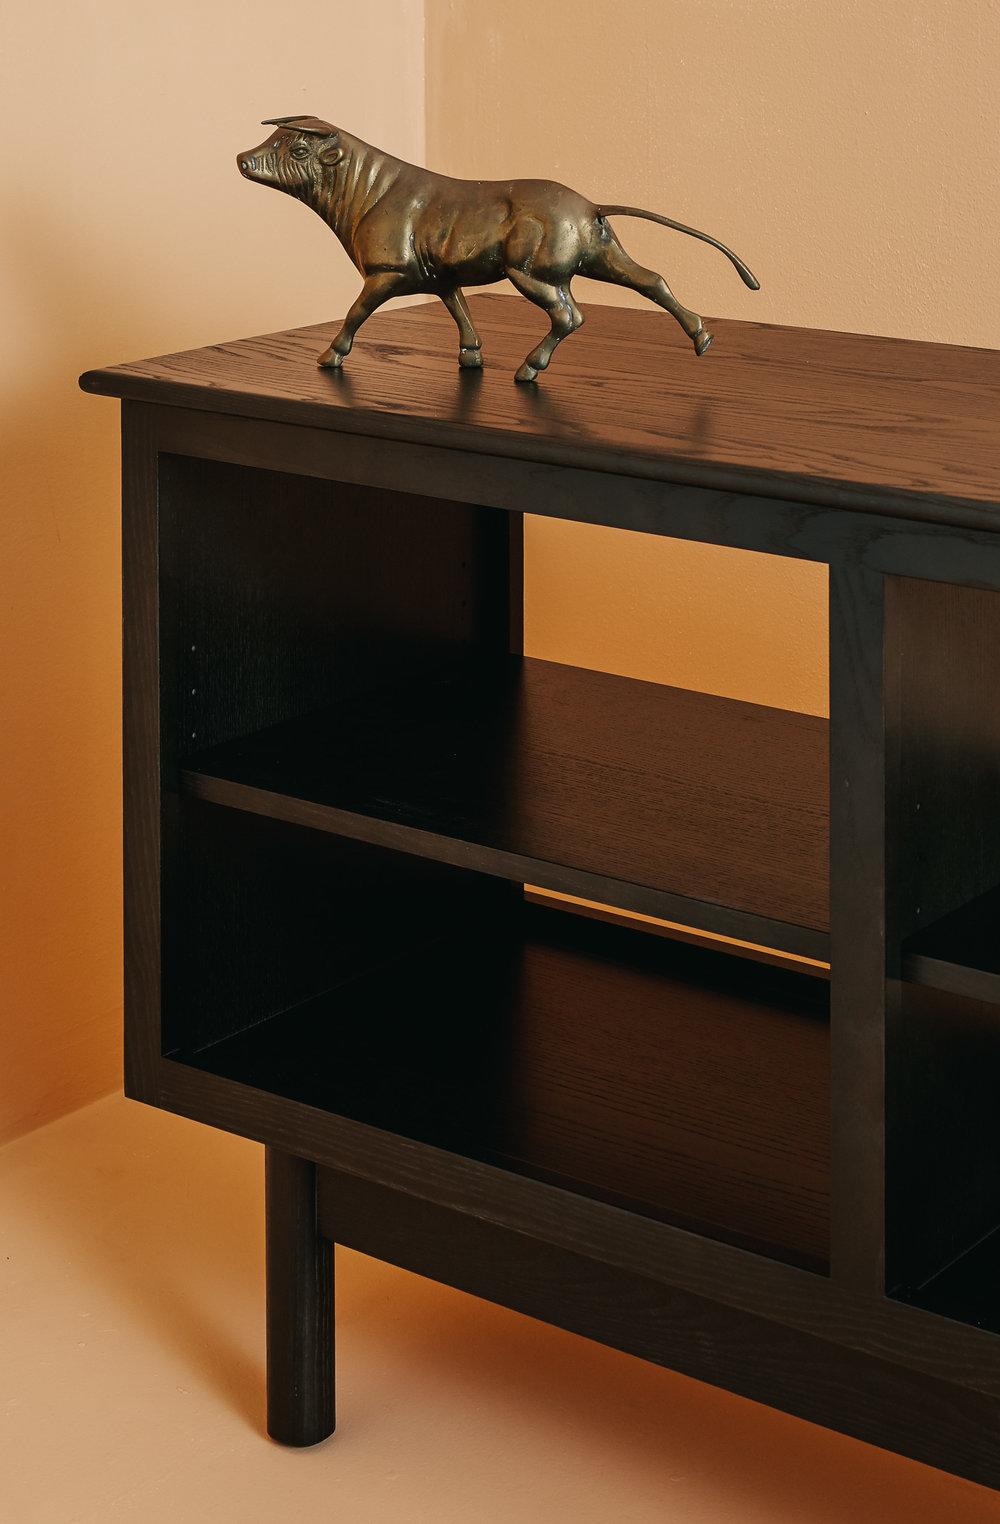 adjustable shelves small open bookcase .jpg